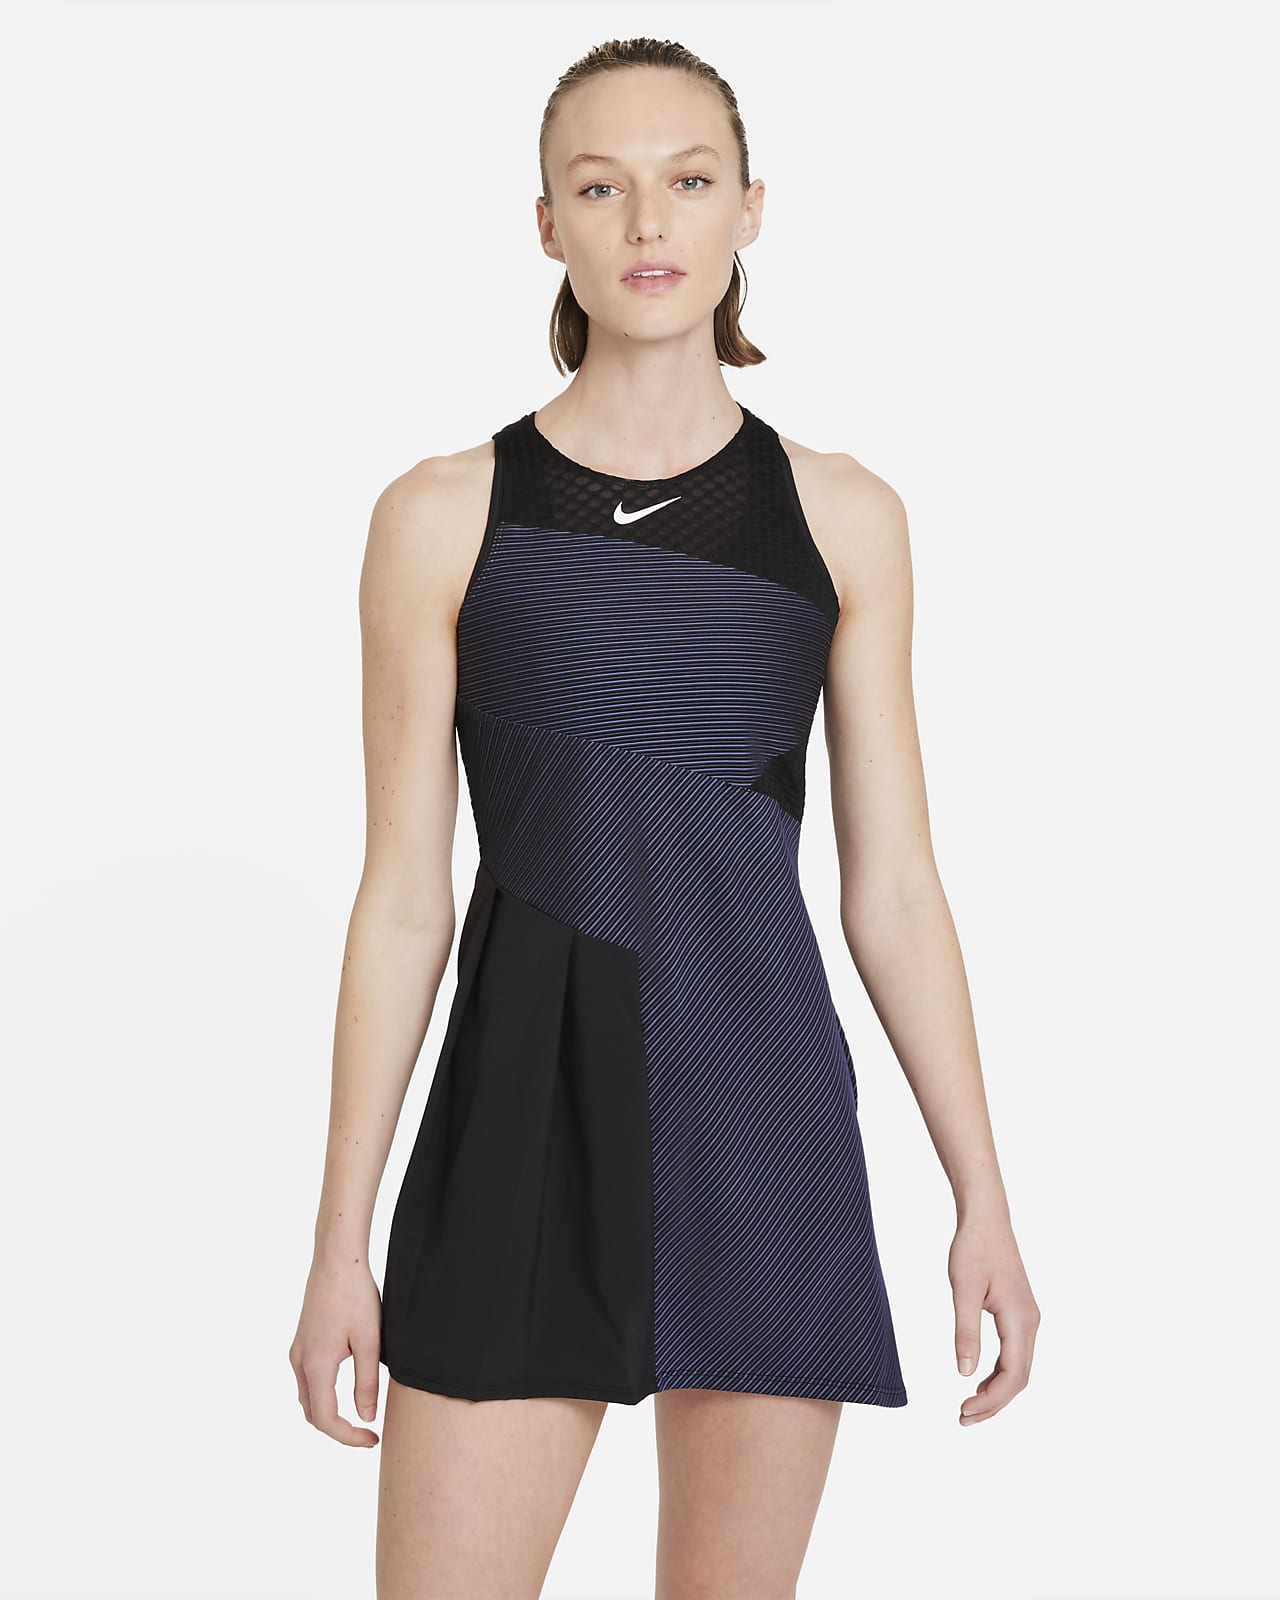 Vestido de ténis NikeCourt Dri-FIT ADV Slam para mulher